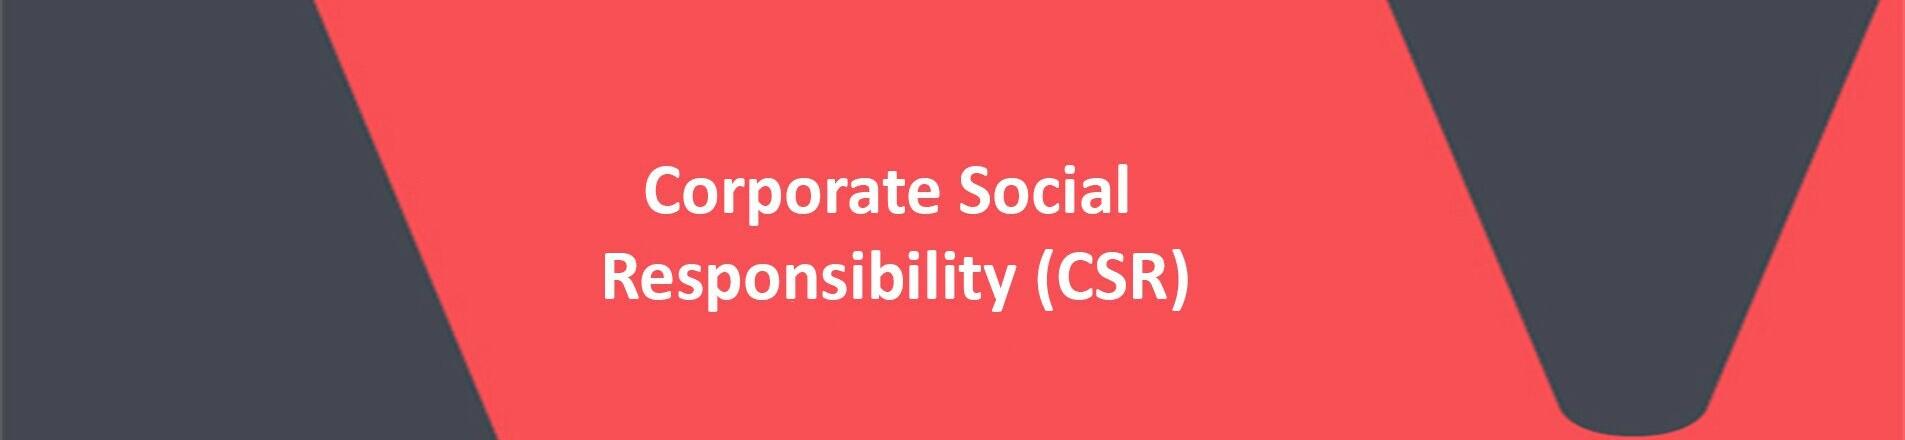 Corporate Social Responsibility.